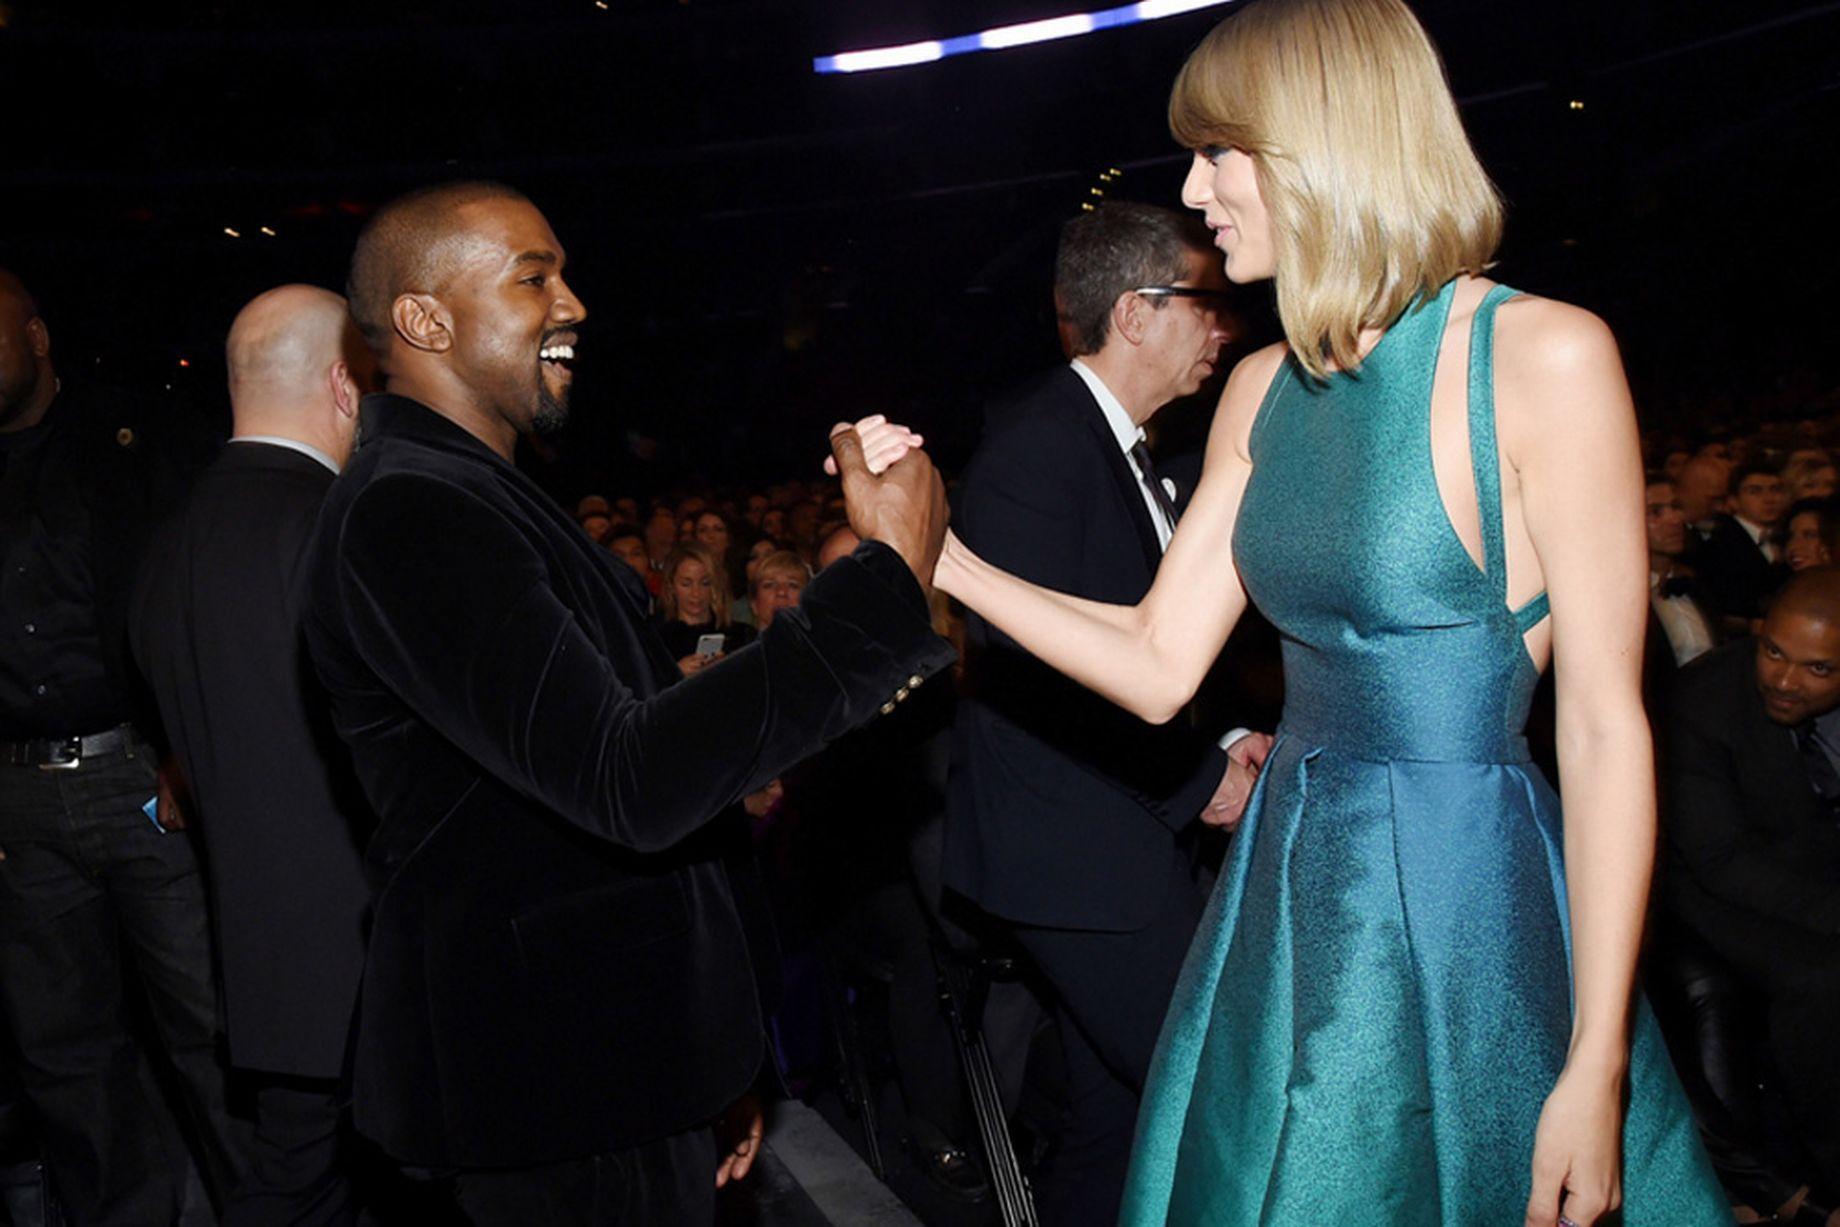 Kim Kardashian Taylor Swift Approved Famous Song Taylor Swift Kanye West Kanye West And Kim Kim Kardashian And Kanye